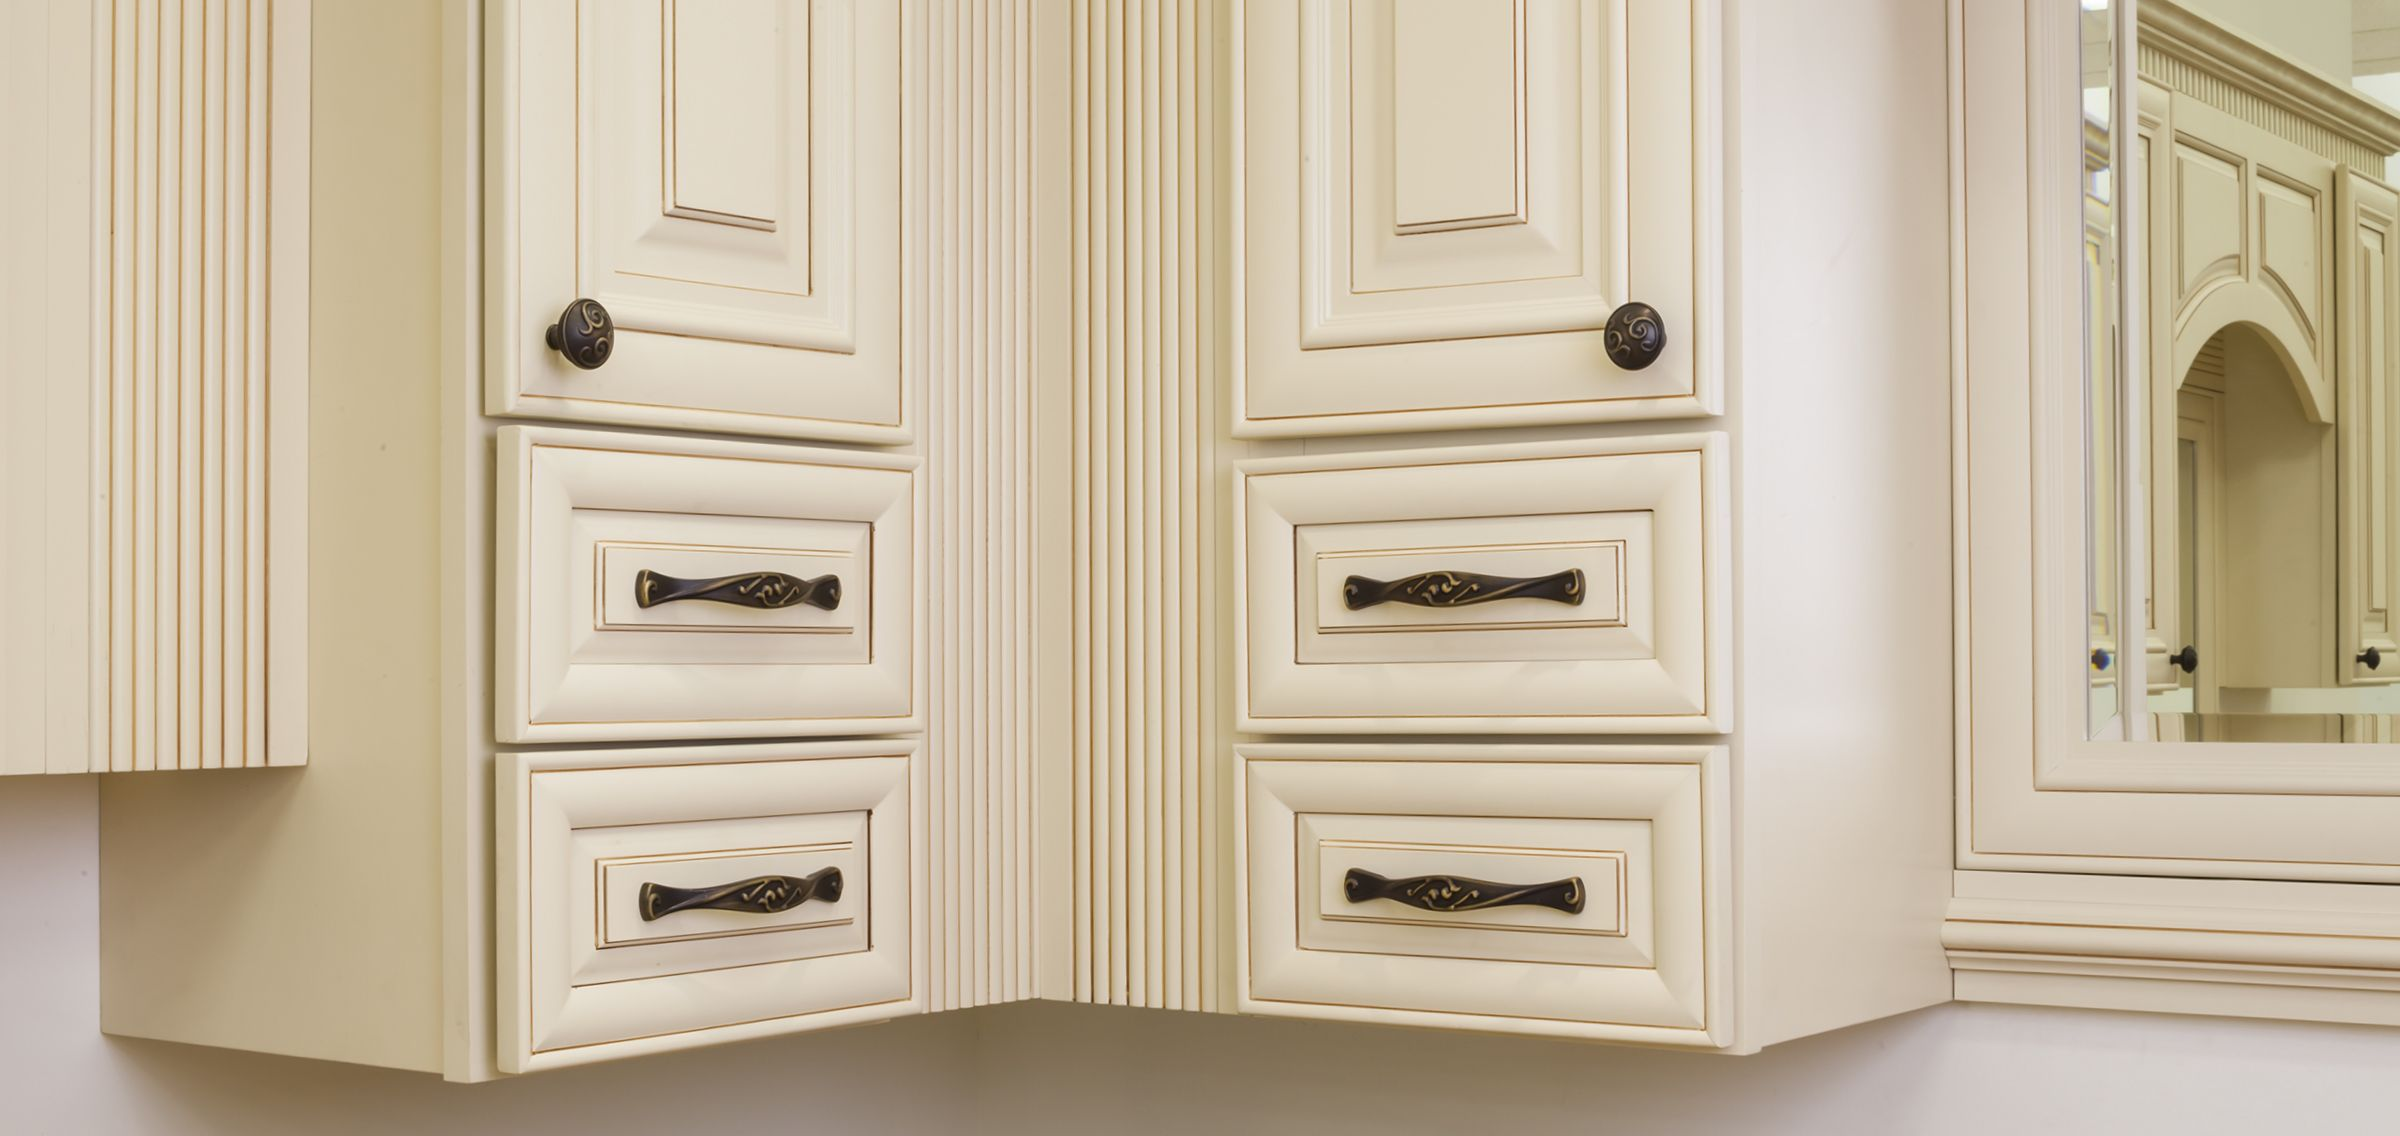 kensington cabinet knob pull from jeffrey alexander by hardware